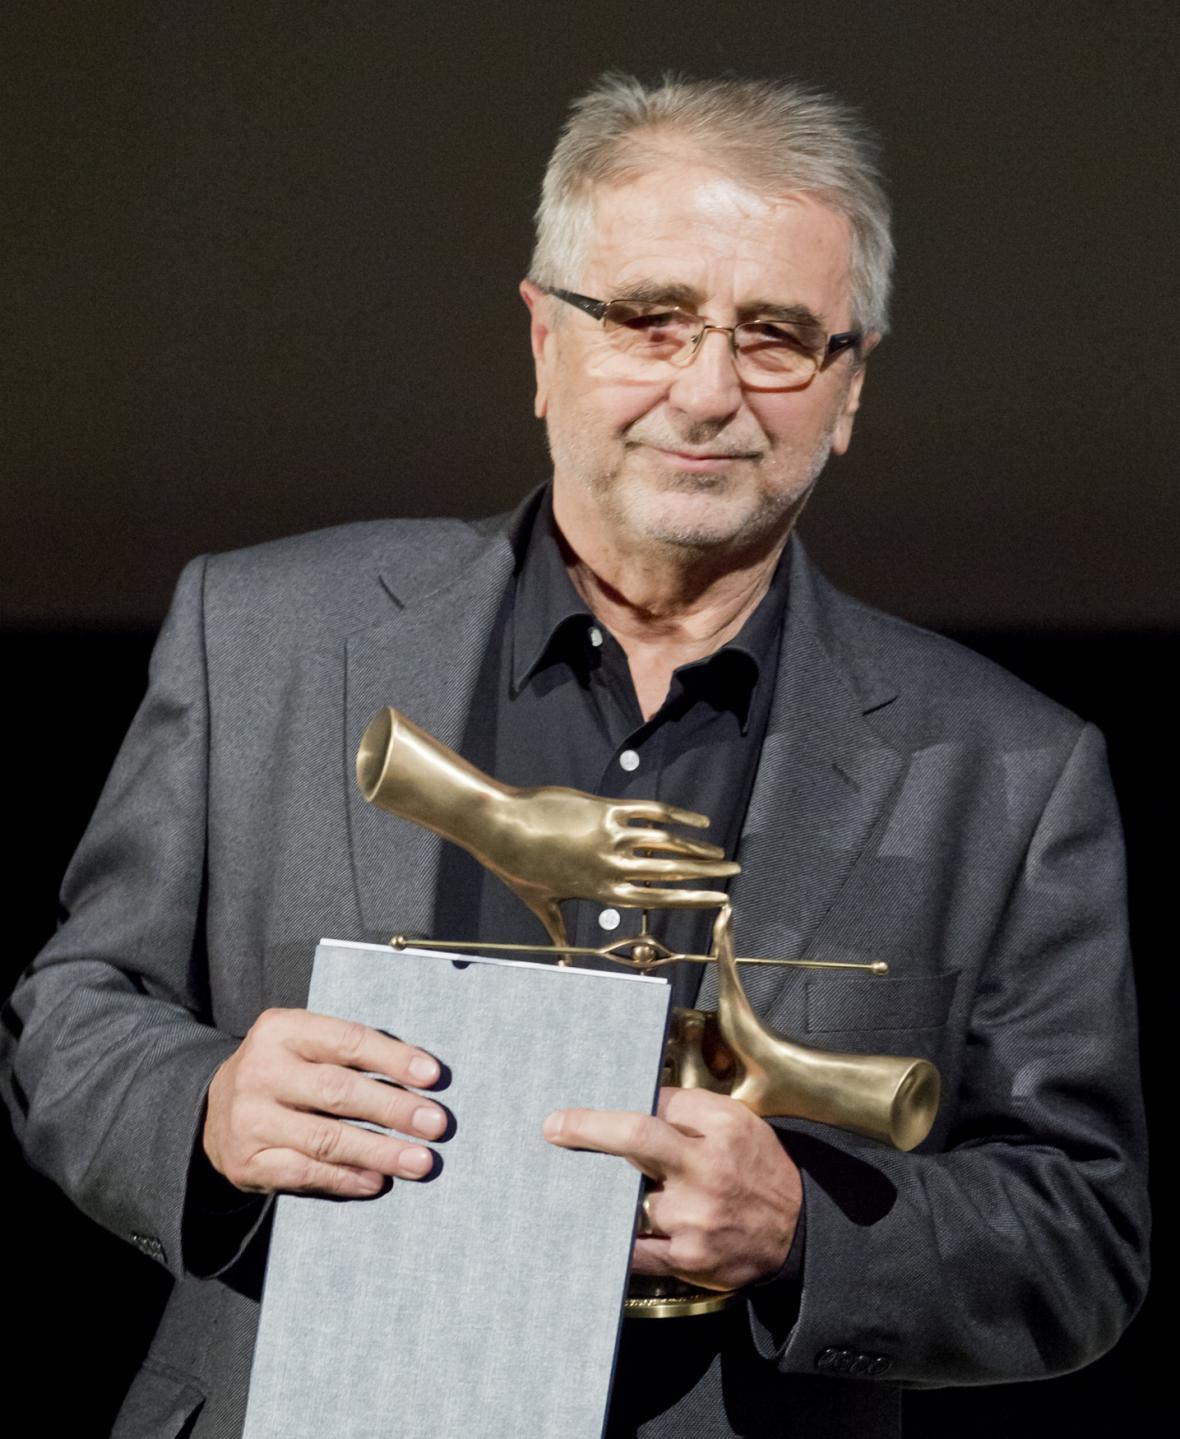 Ivo Popek